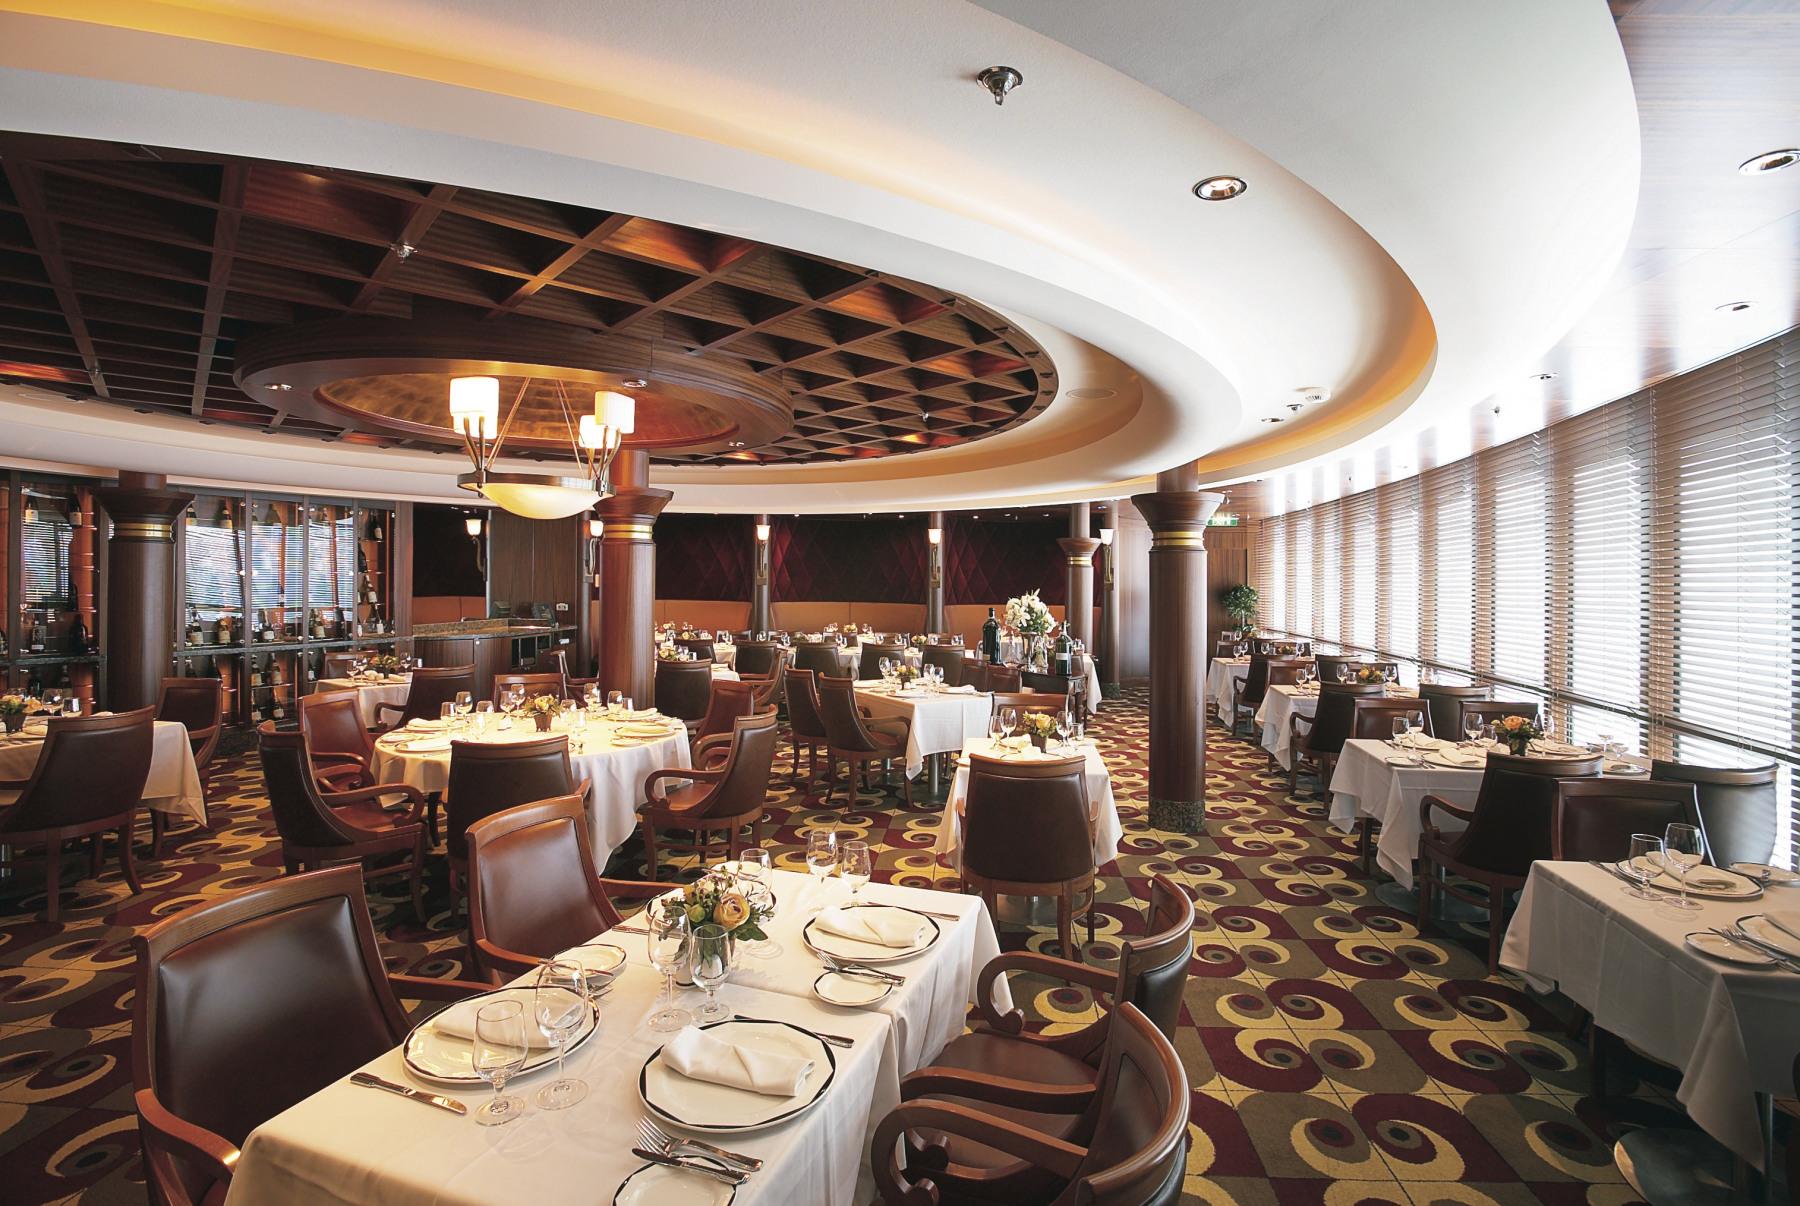 Royal Caribbean International Jewel of the Seas Interior Chops Grille 4.jpeg